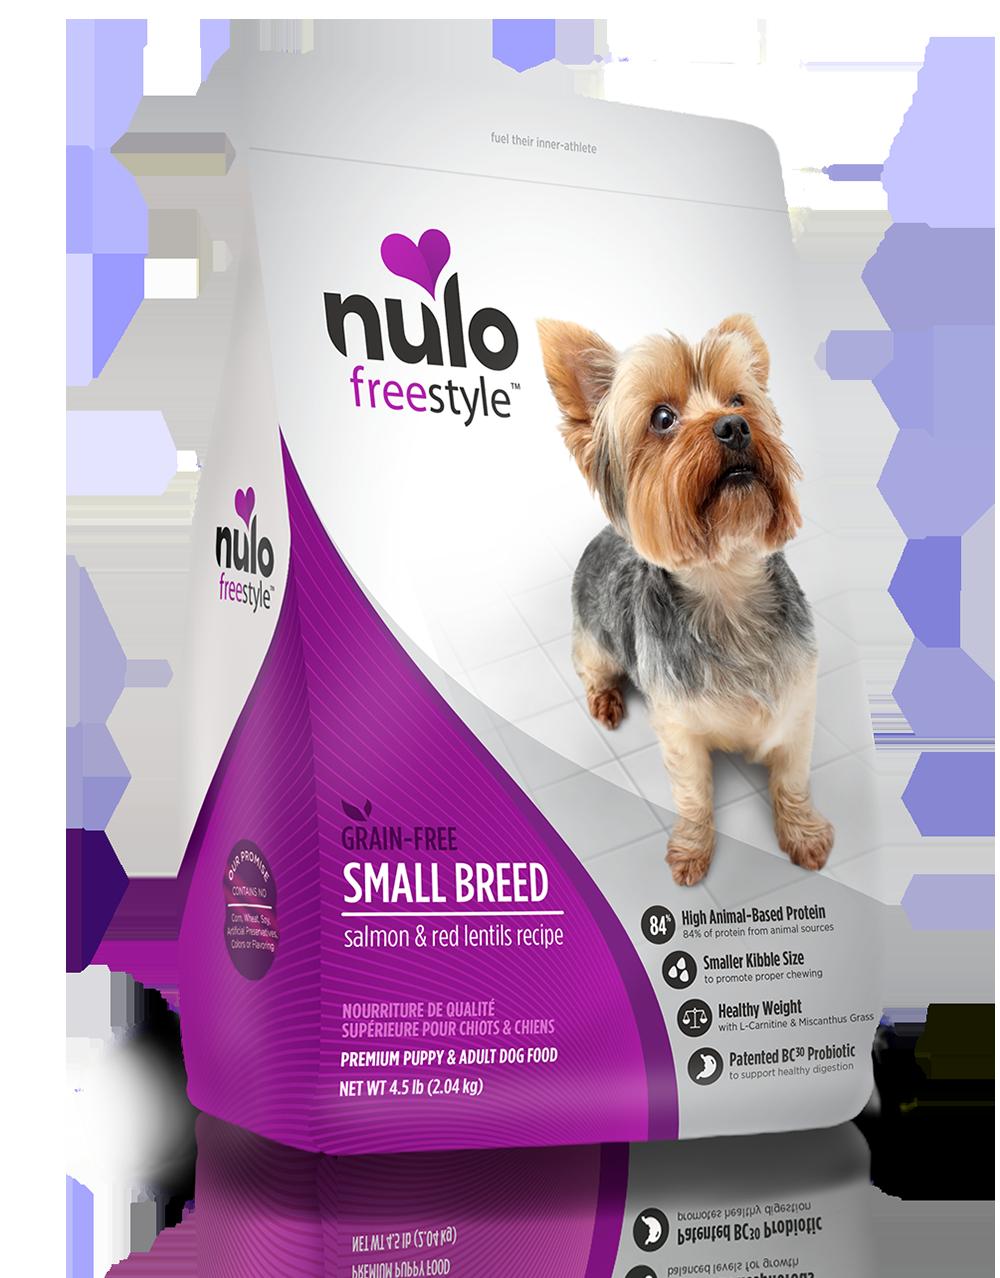 Nulo FreeStyle Grain-Free Dog Food